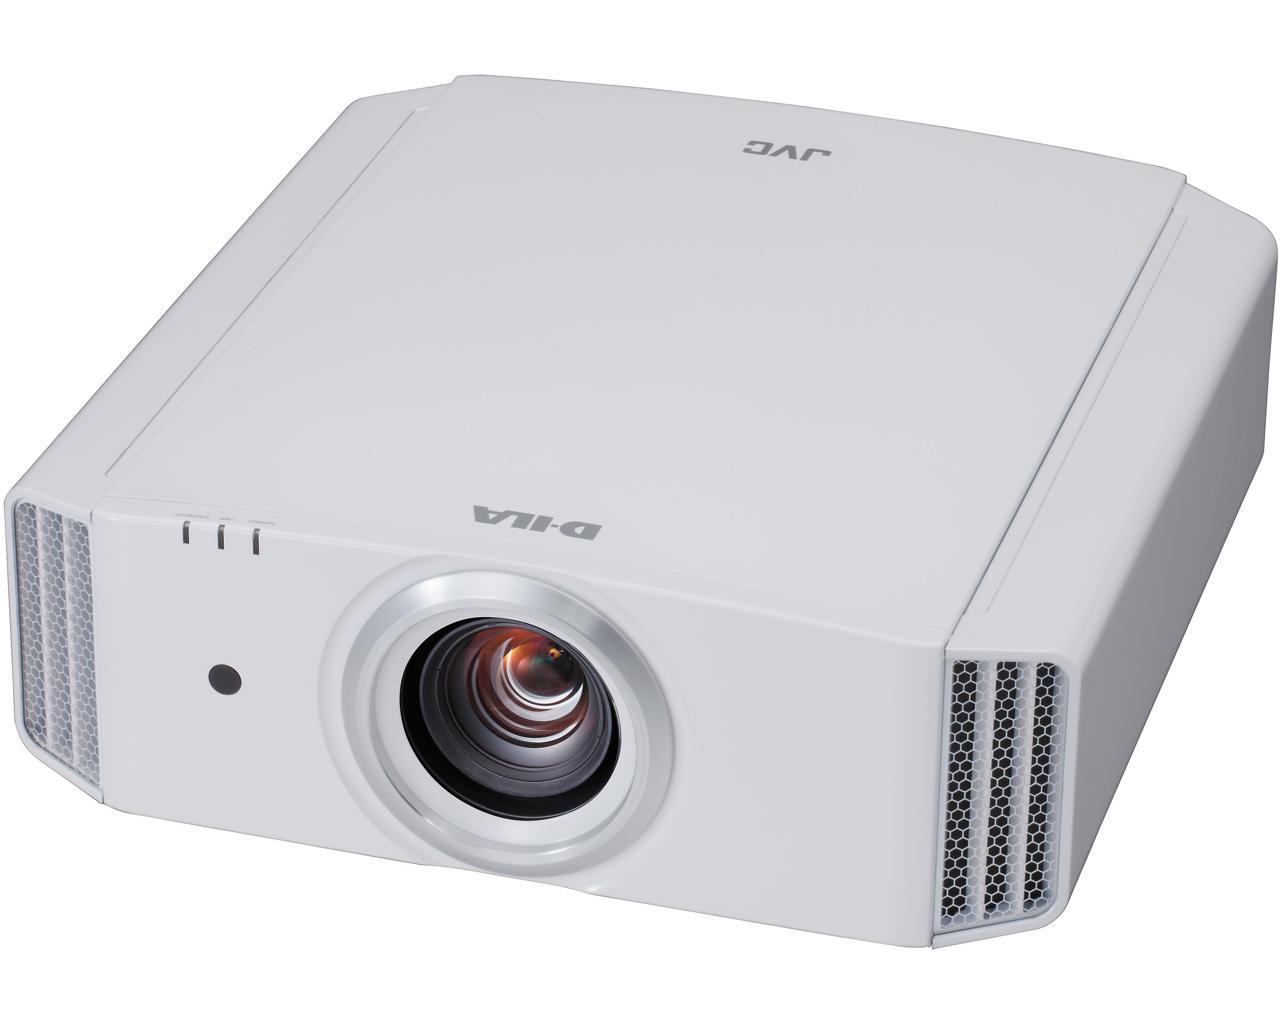 DLA-X500RWE